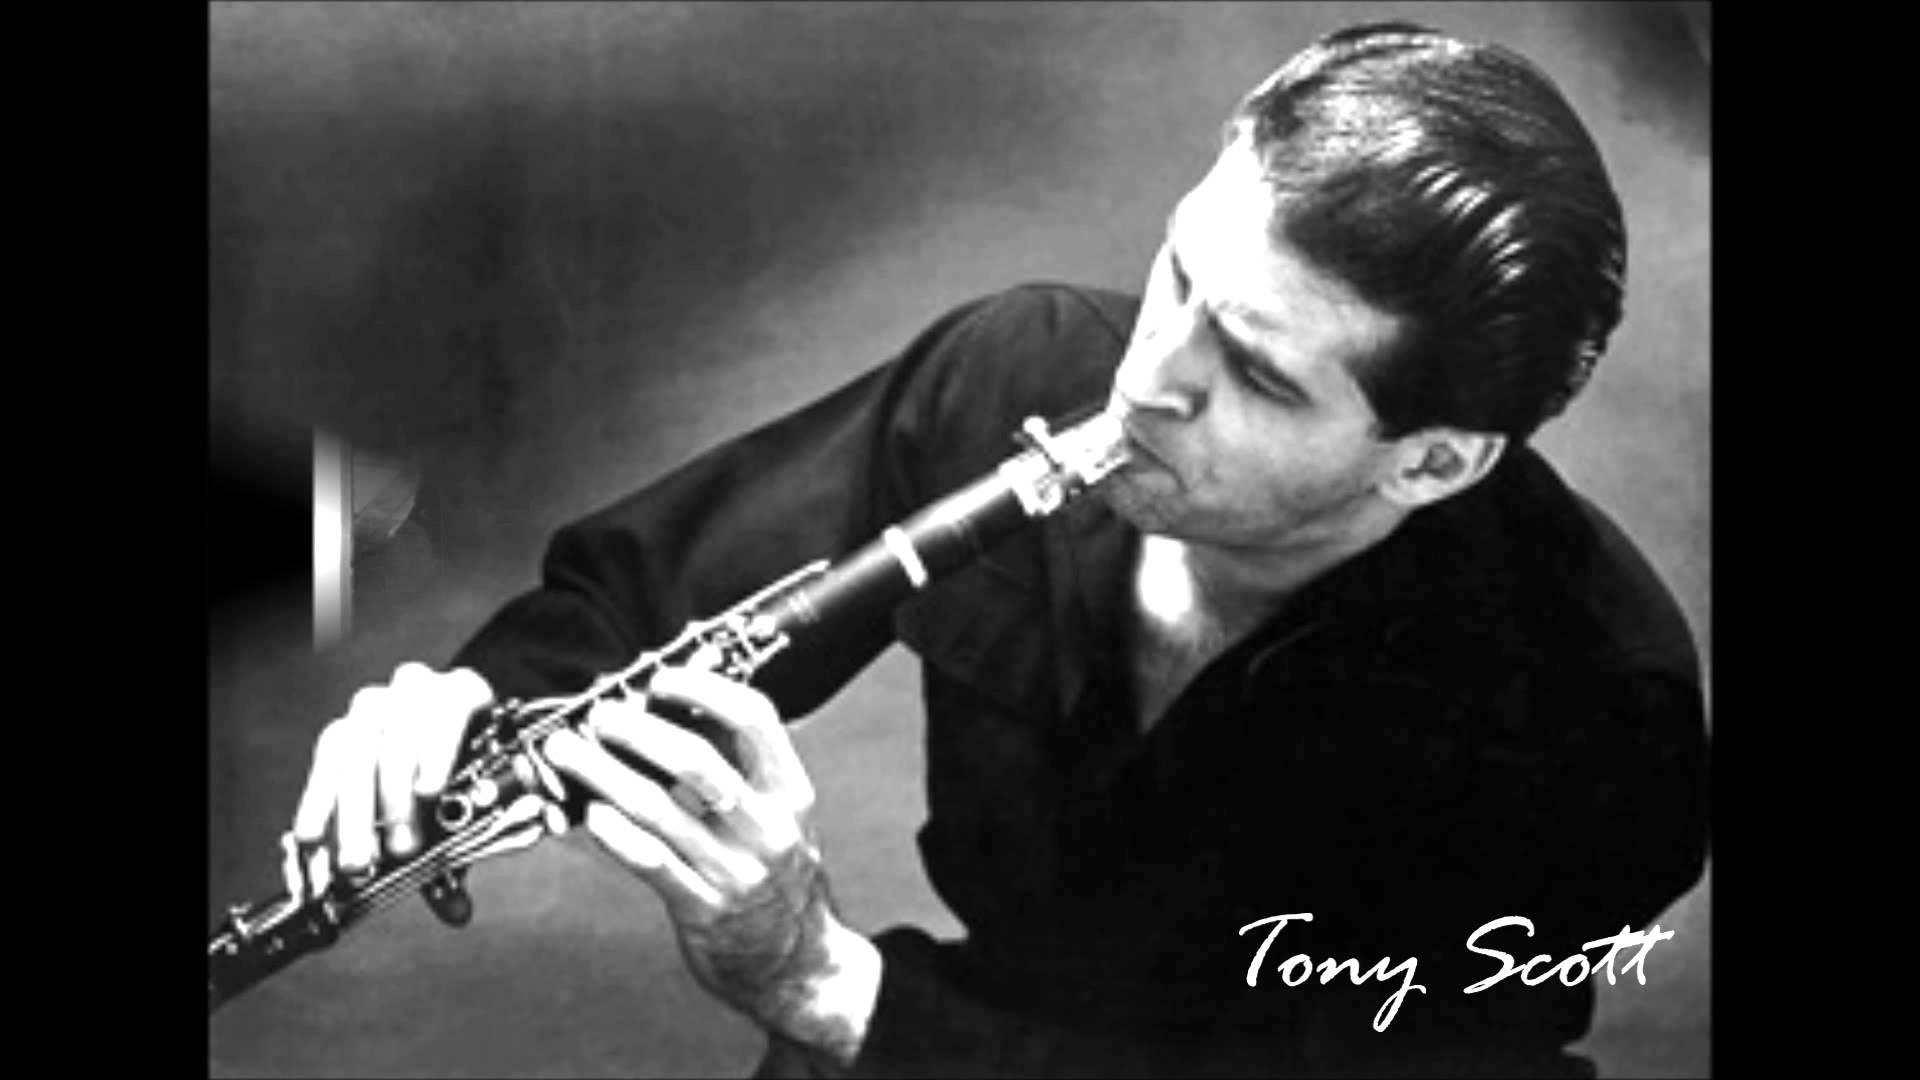 TONY SCOTT & ROMANO MUSSOLINI-The Falling Leaves